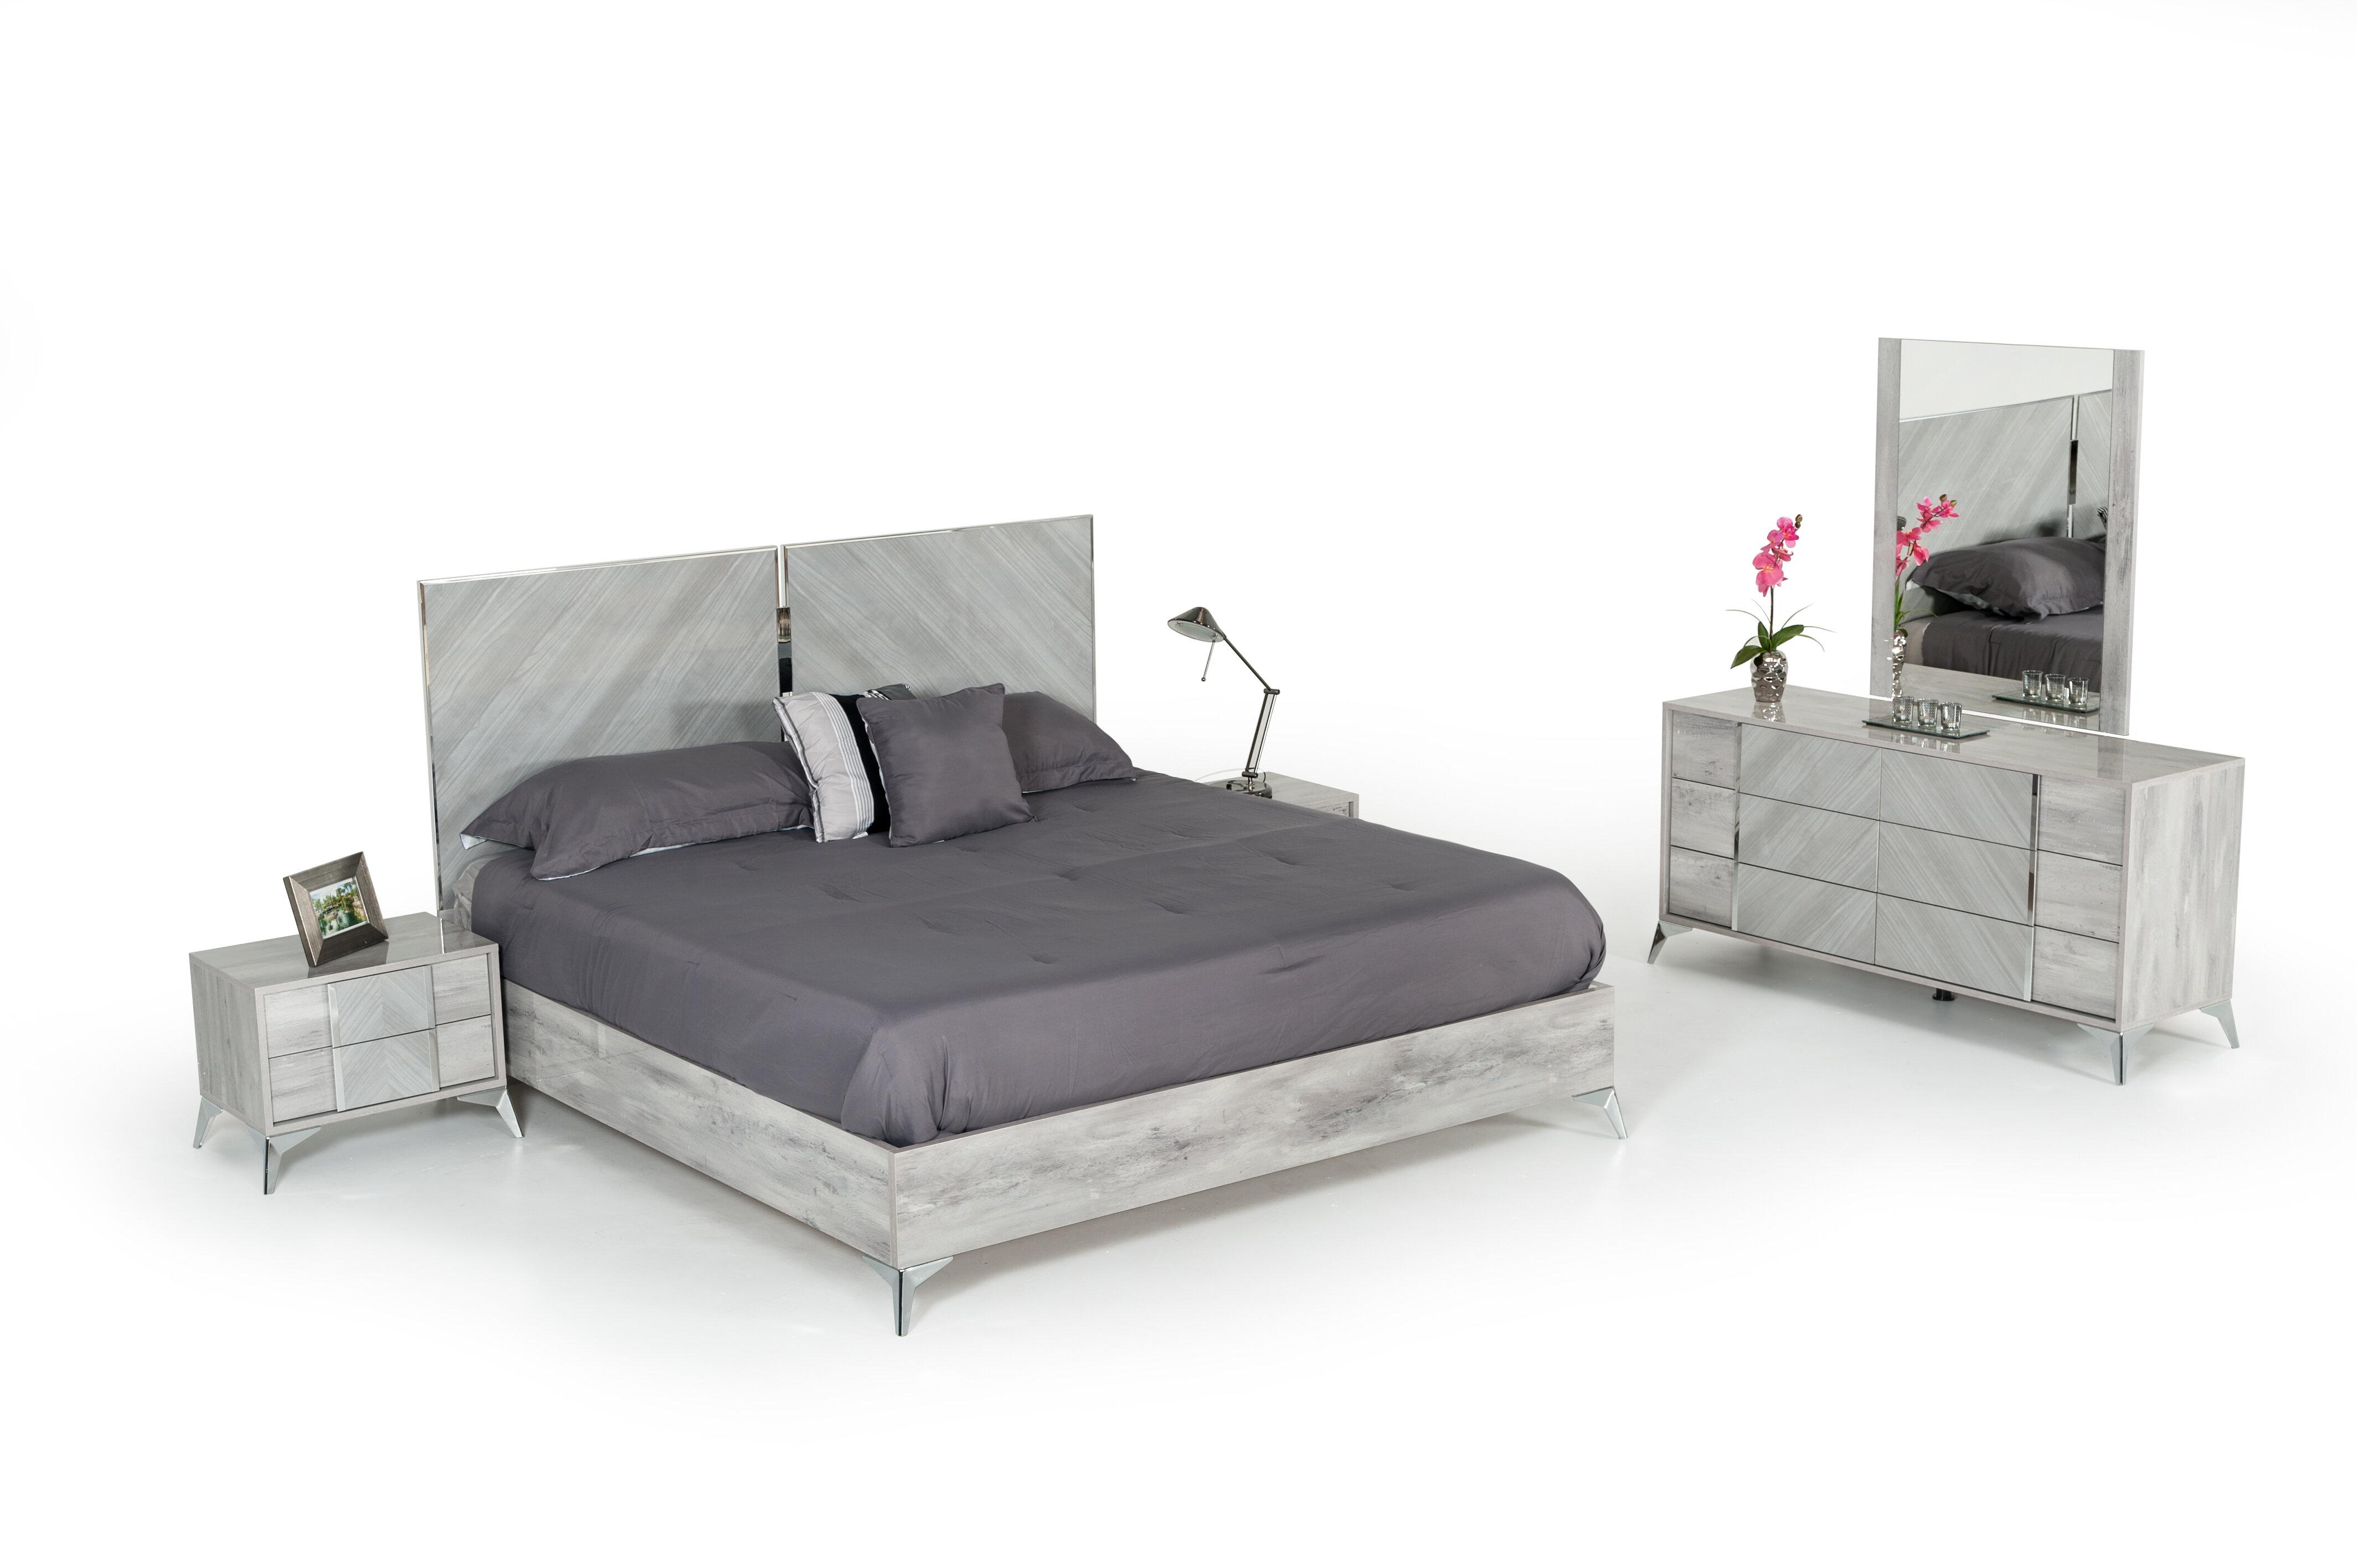 Swell Labombard Modern 5 Piece Platform Bedroom Set Download Free Architecture Designs Intelgarnamadebymaigaardcom